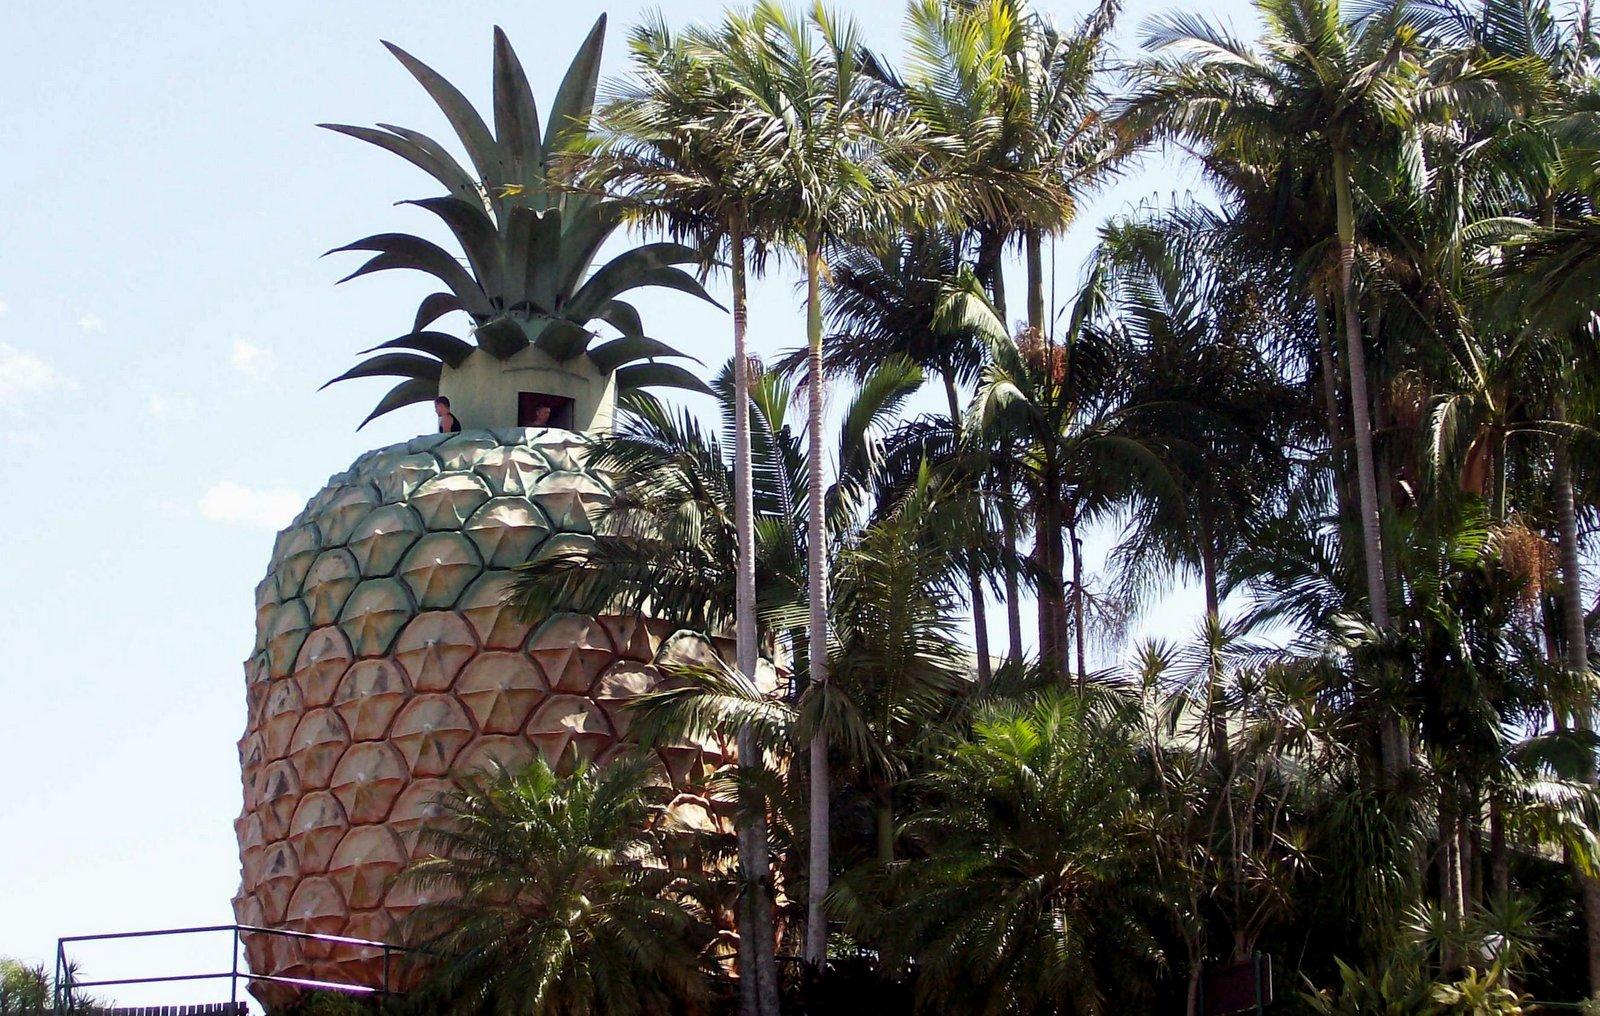 Big Pineapple in Woombye